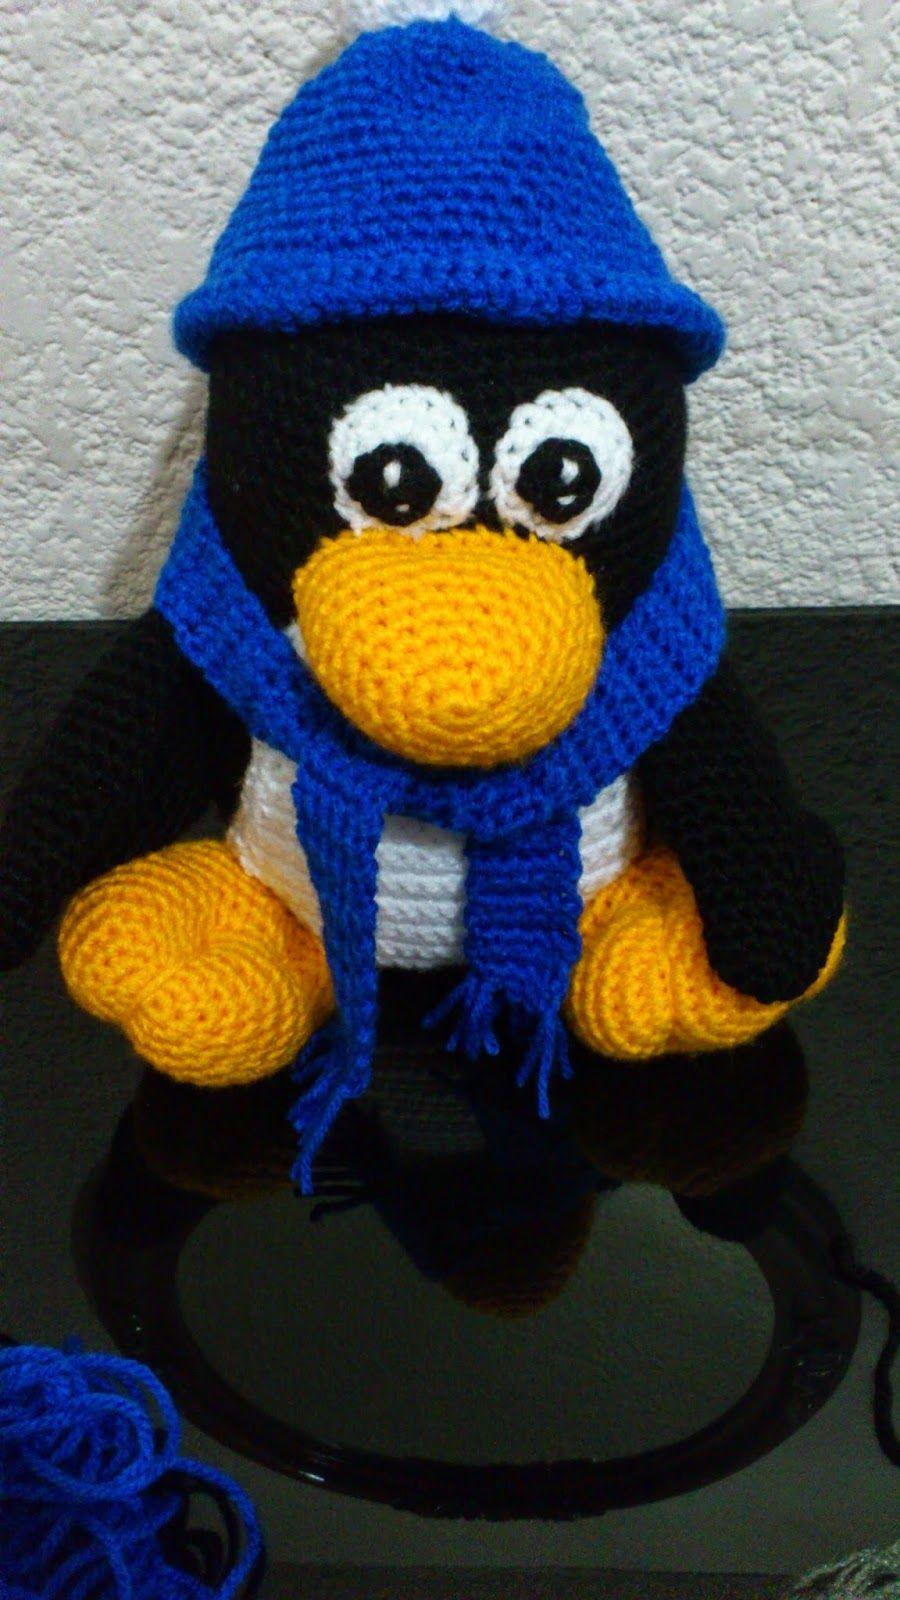 Tutorial Amigurumi Pinguino : Amigurumi Penguin - FREE Crochet Pattern / Tutorial FREE ...